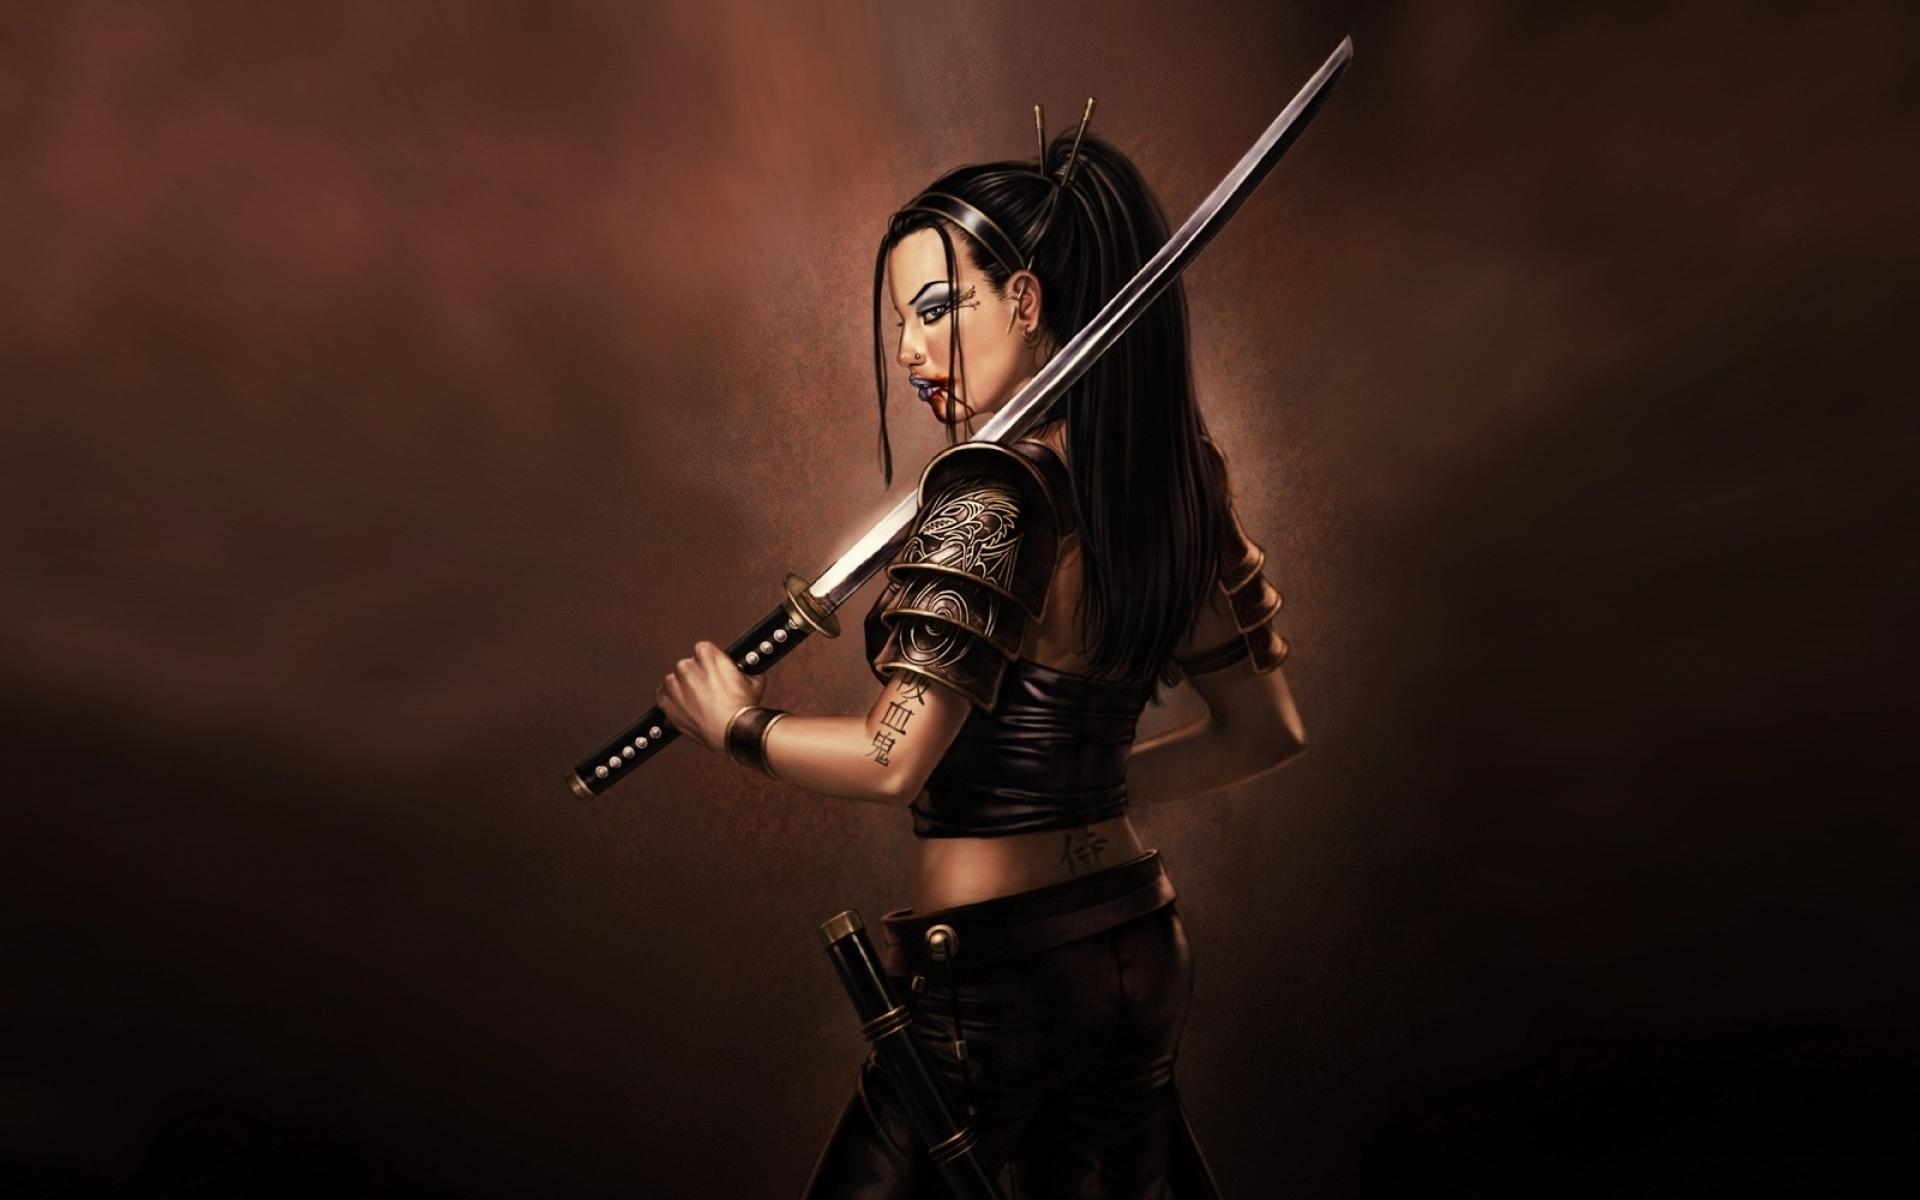 women samurai female warriors 1600x1200 wallpaper People HD Wallpaper 1920x1200